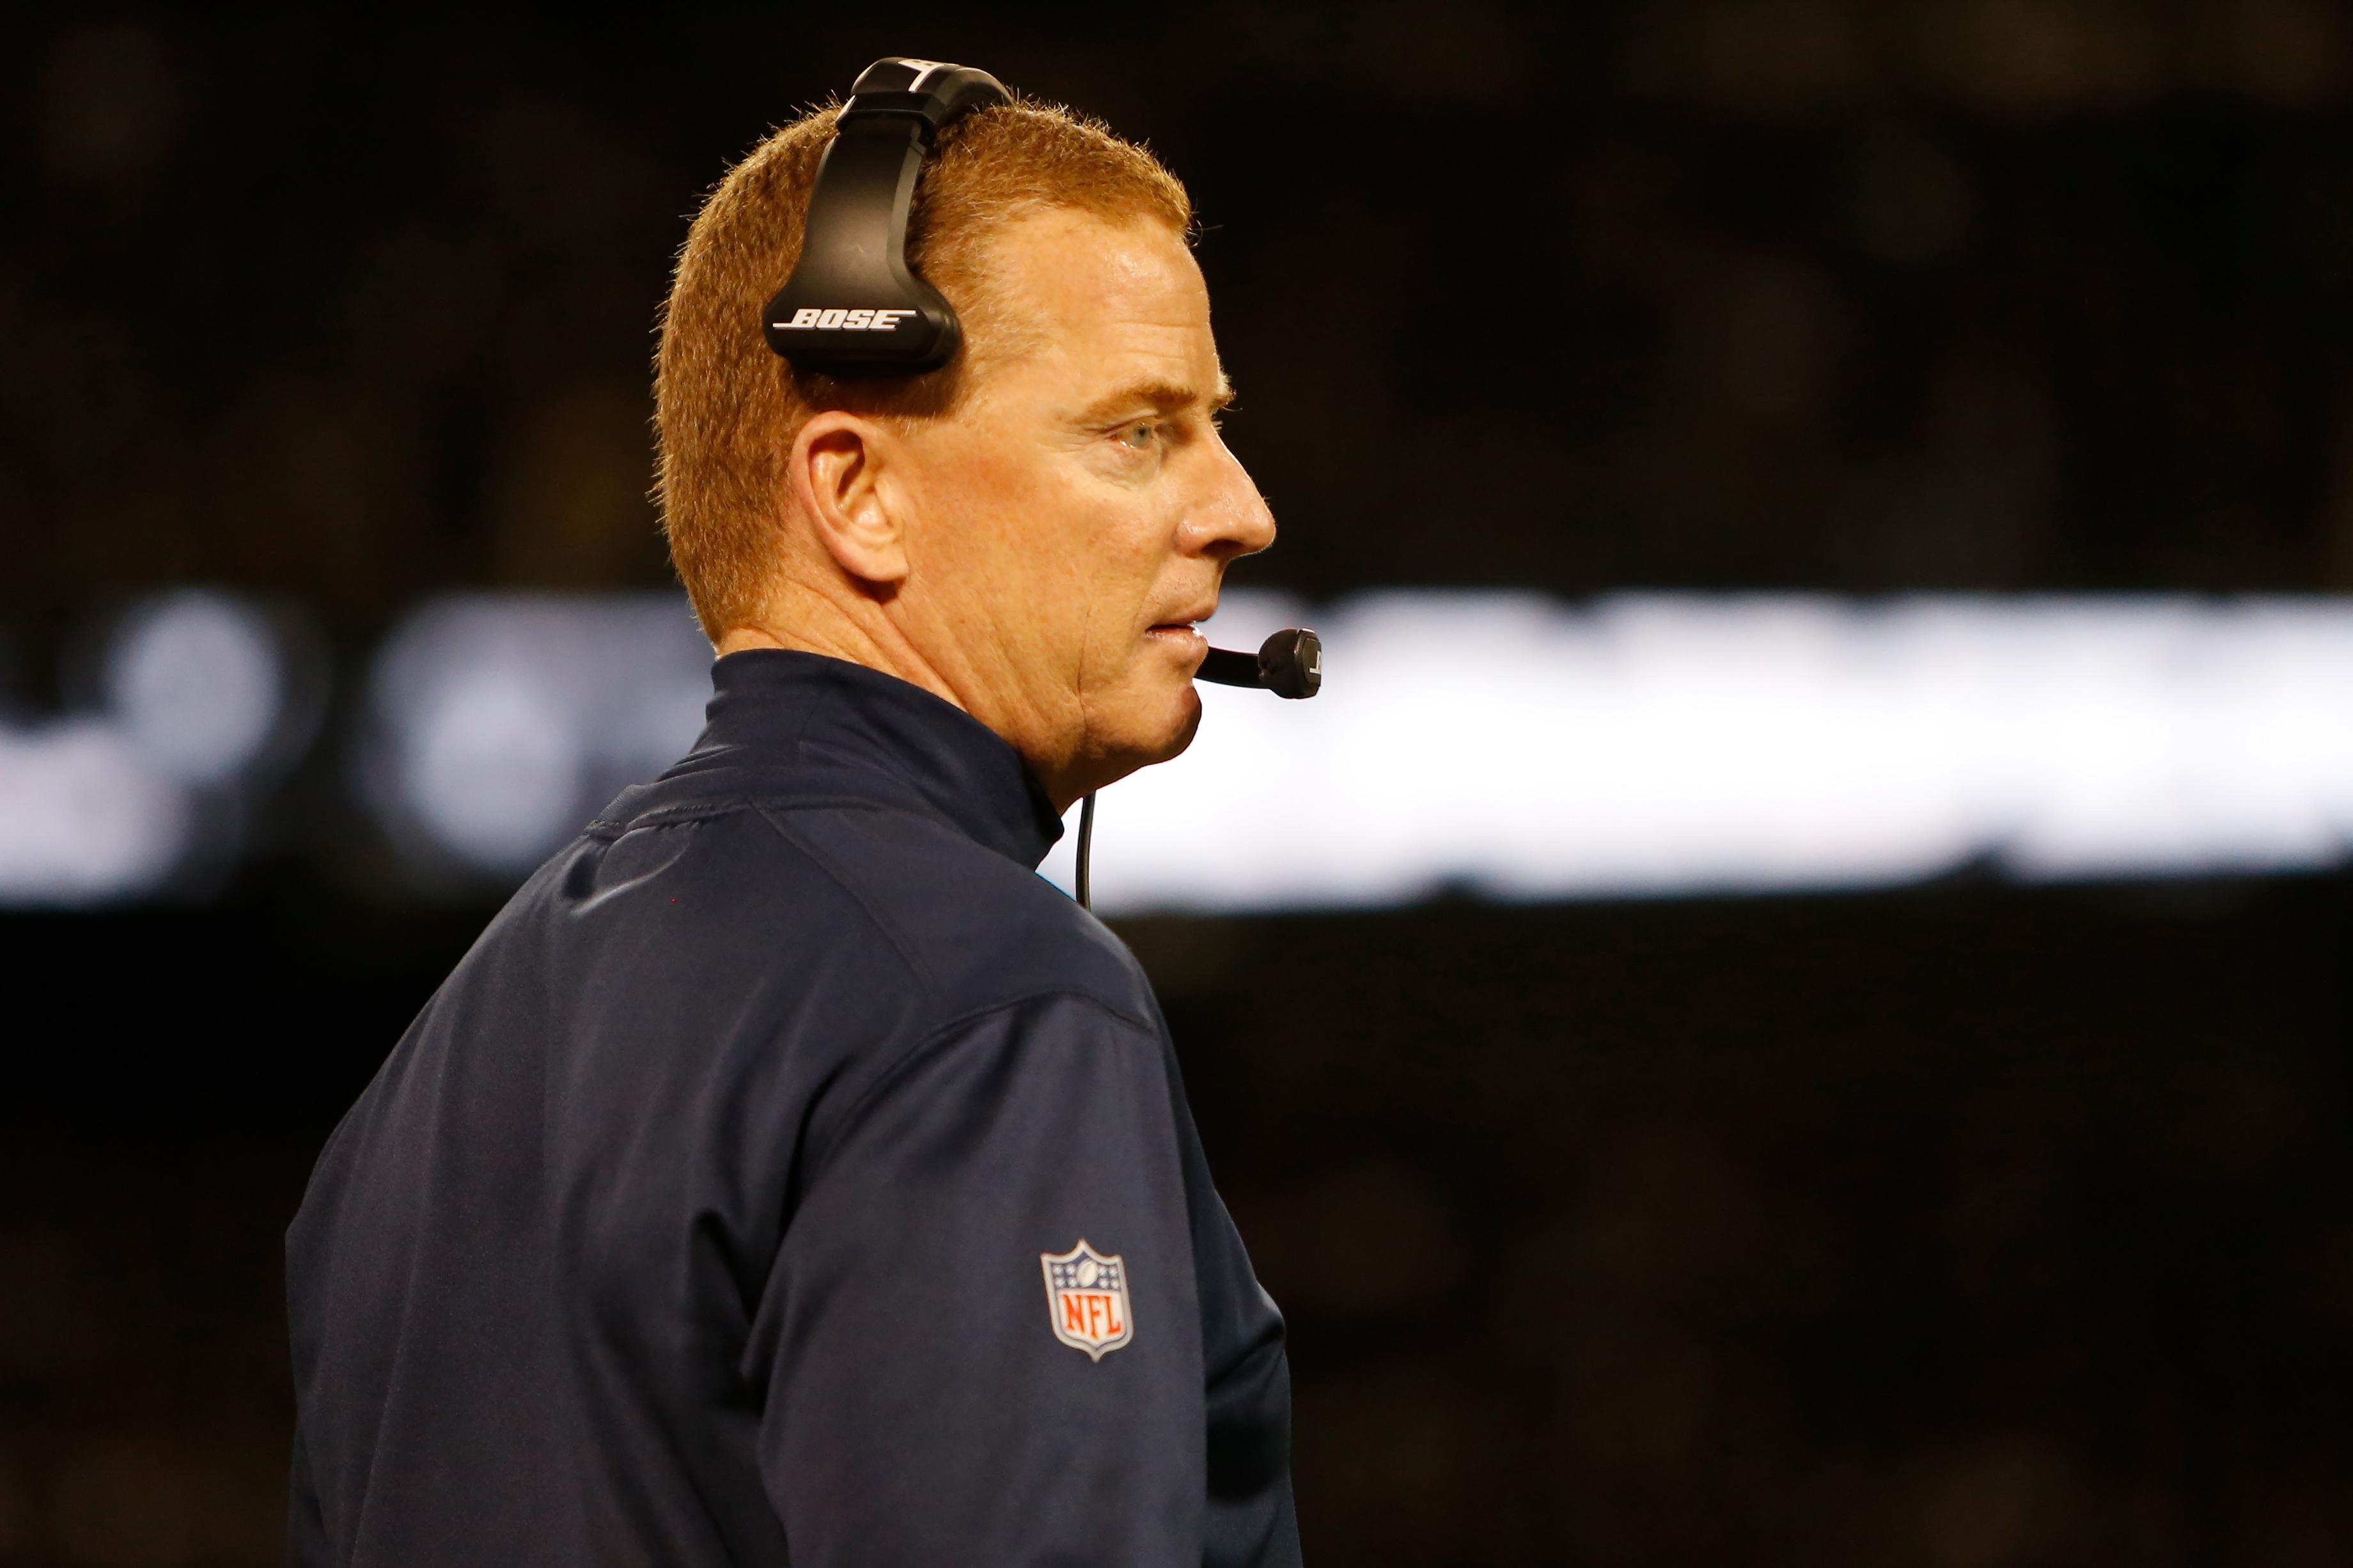 Seahawks keep playoff hopes alive, eliminate Cowboys